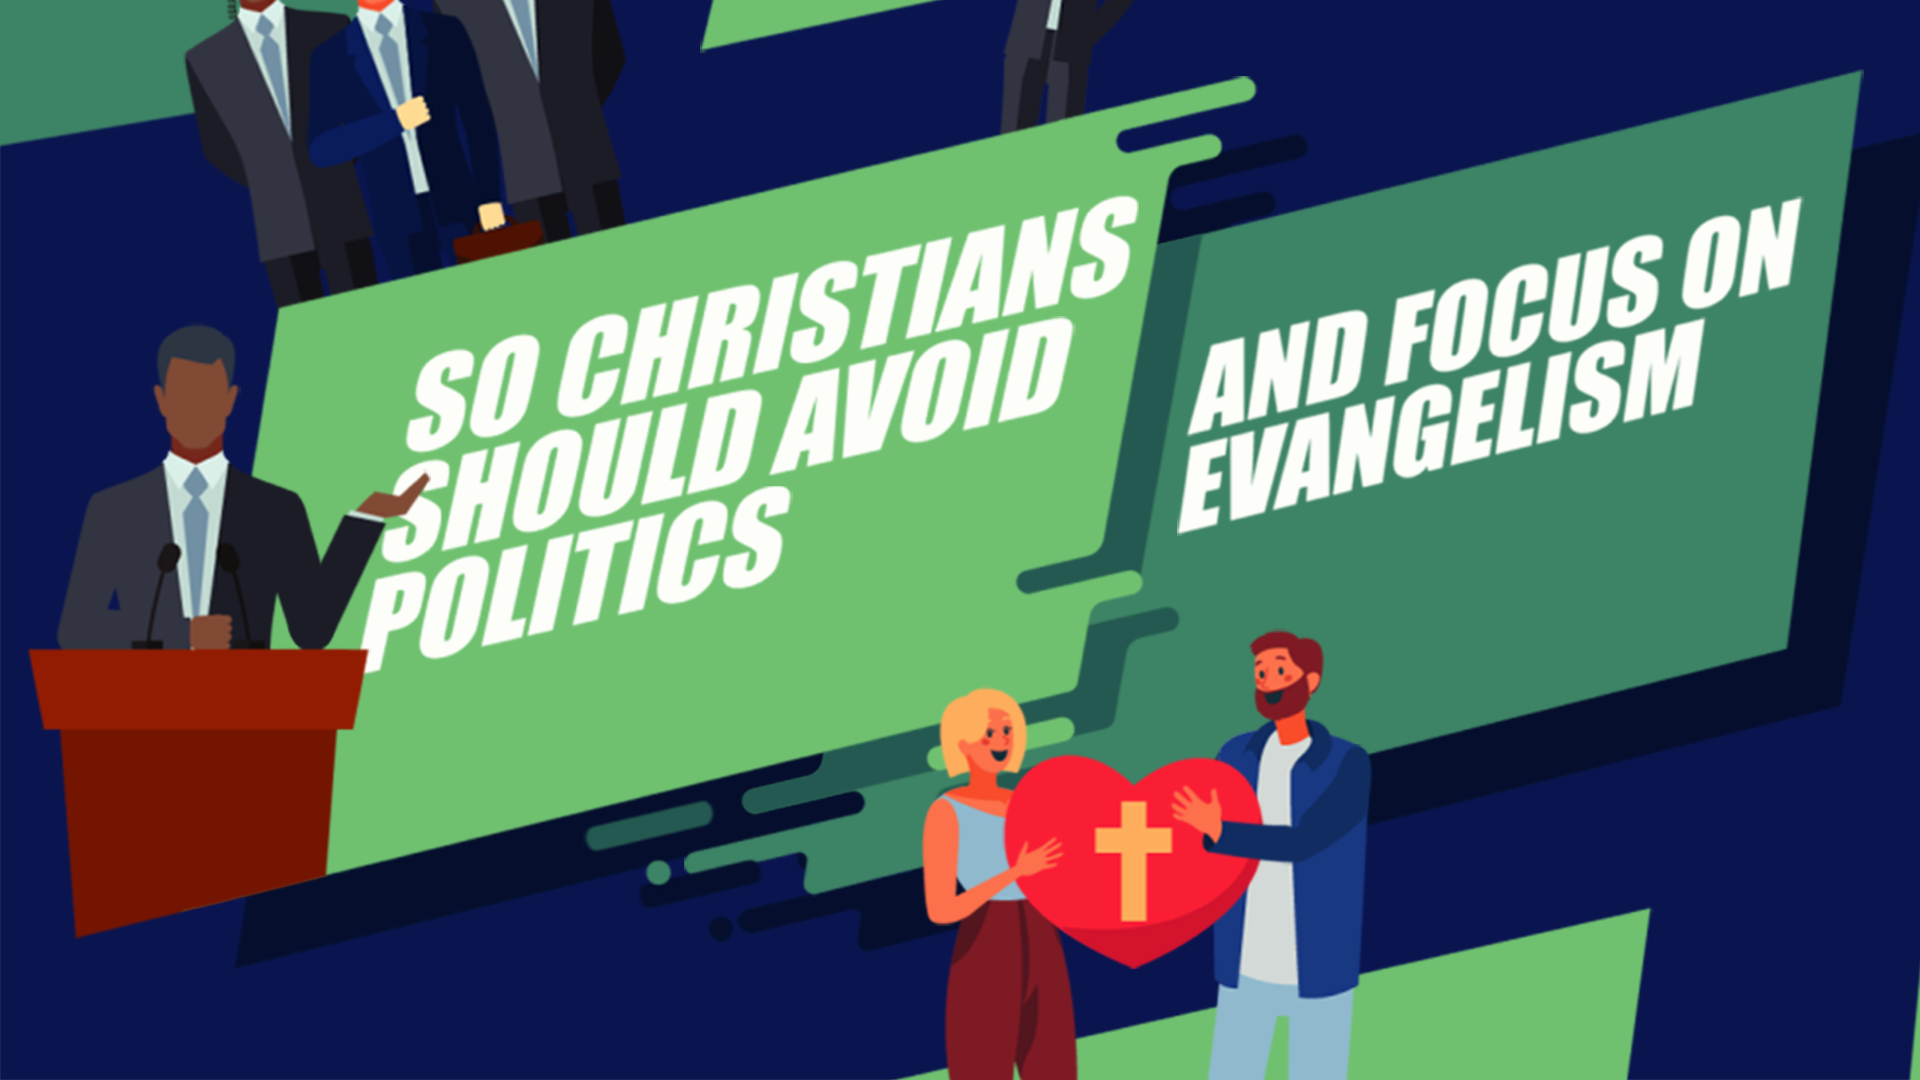 Christians Should Avoid Politics and Focus on Evangelism